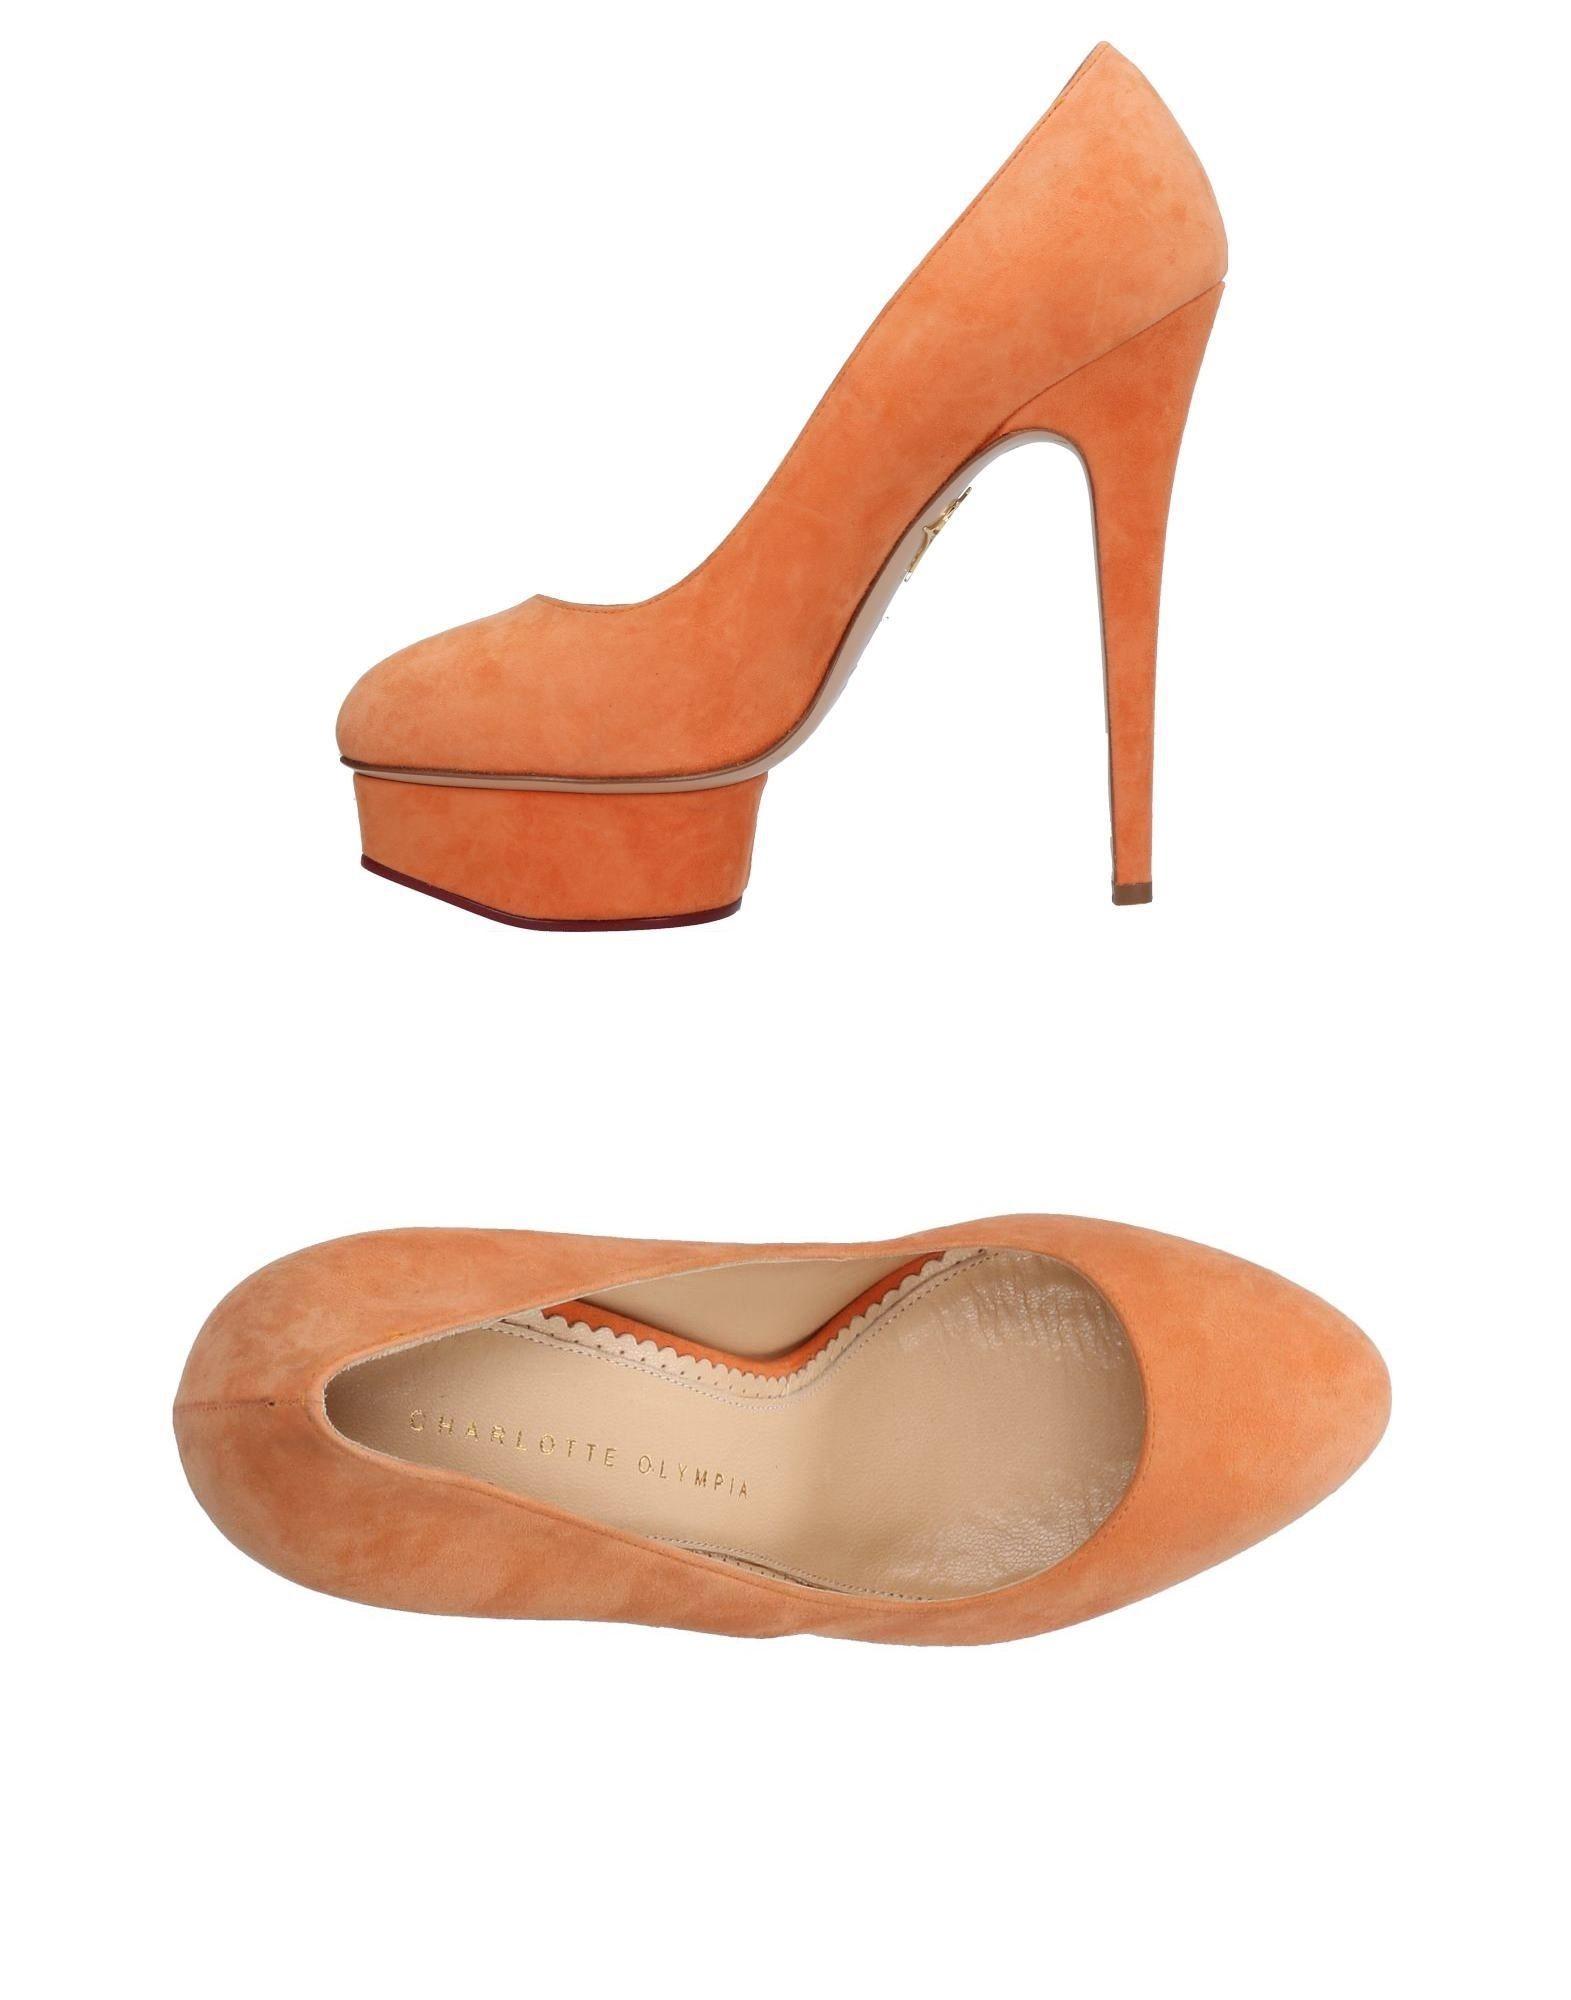 Charlotte Olympia Pumps Damen  11500077AGGut aussehende strapazierfähige Schuhe